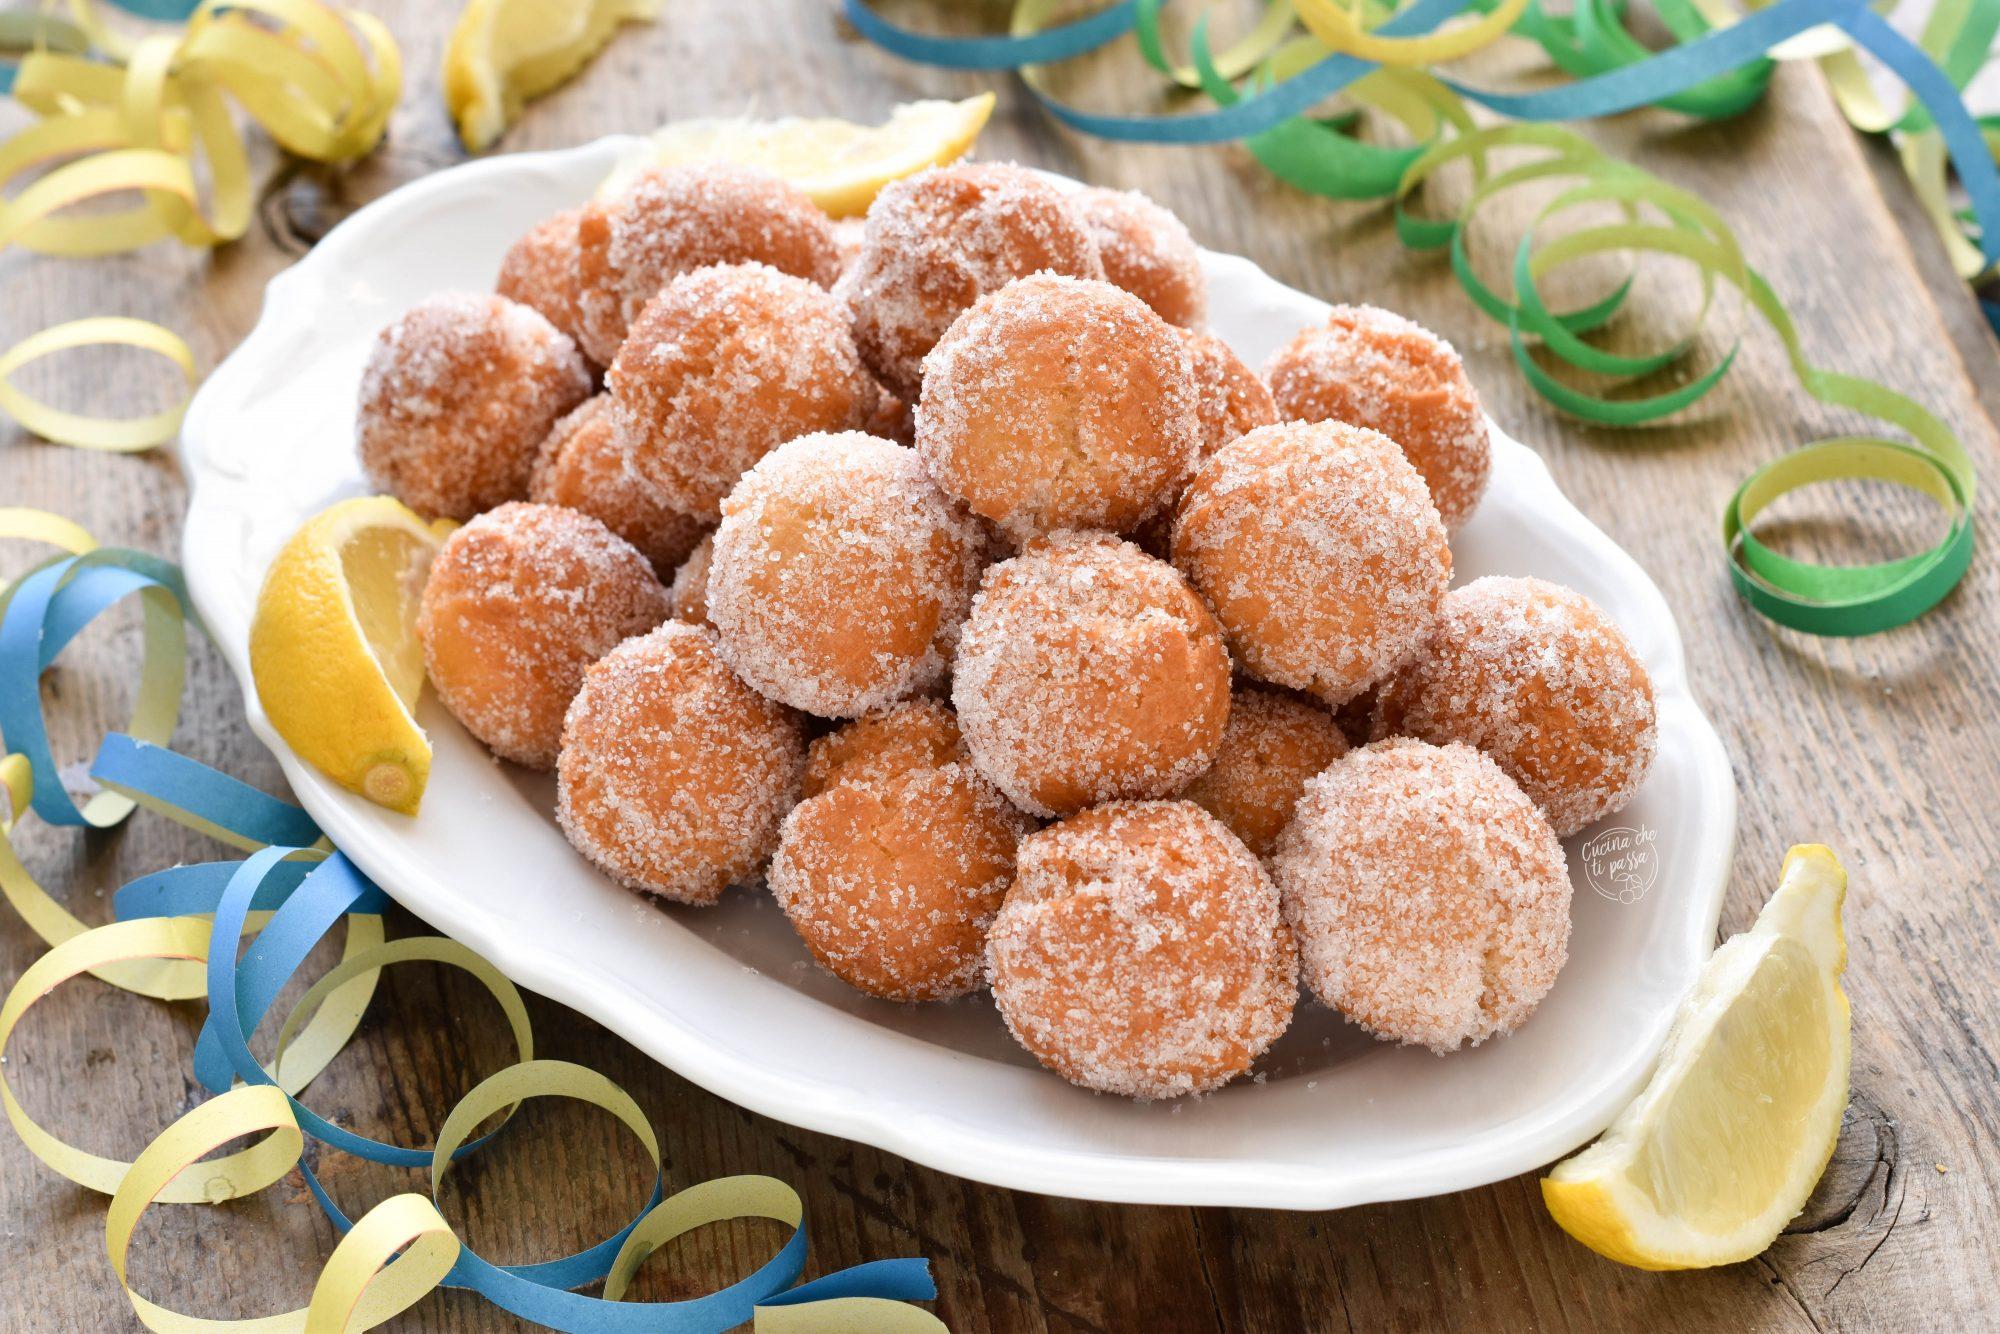 Castagnole al limone ricetta